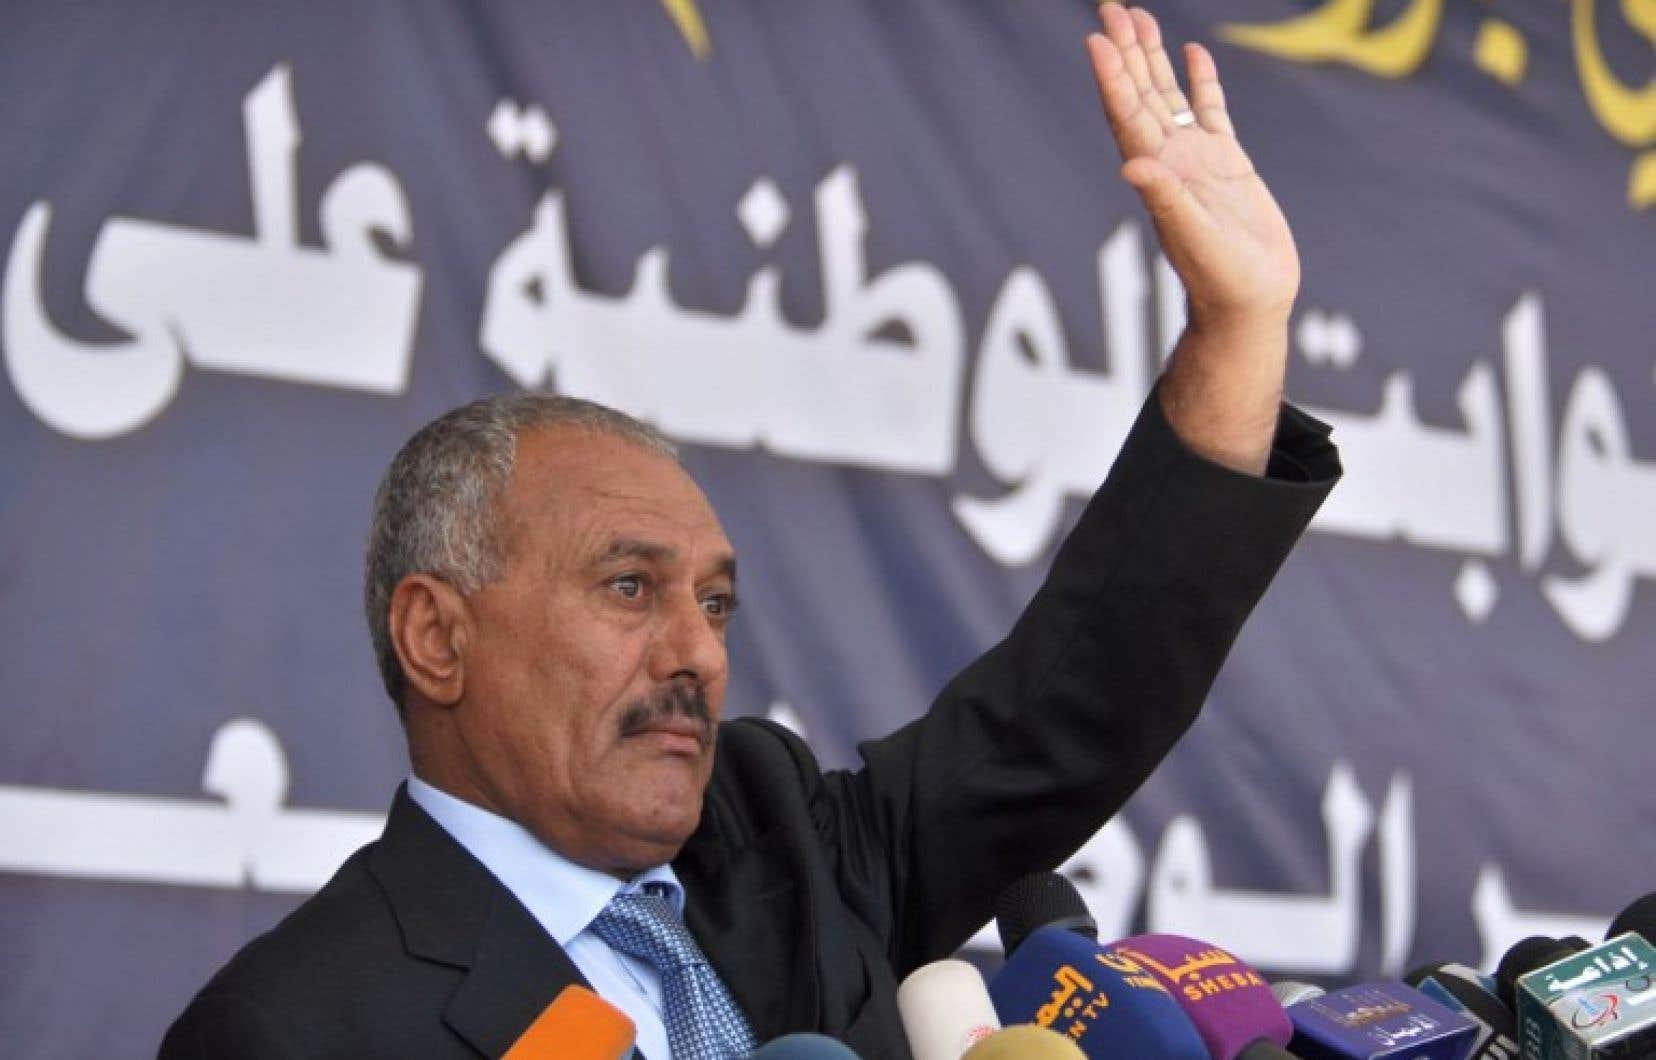 L'ex-président yéménite Ali Abdallah Saleh en 2011